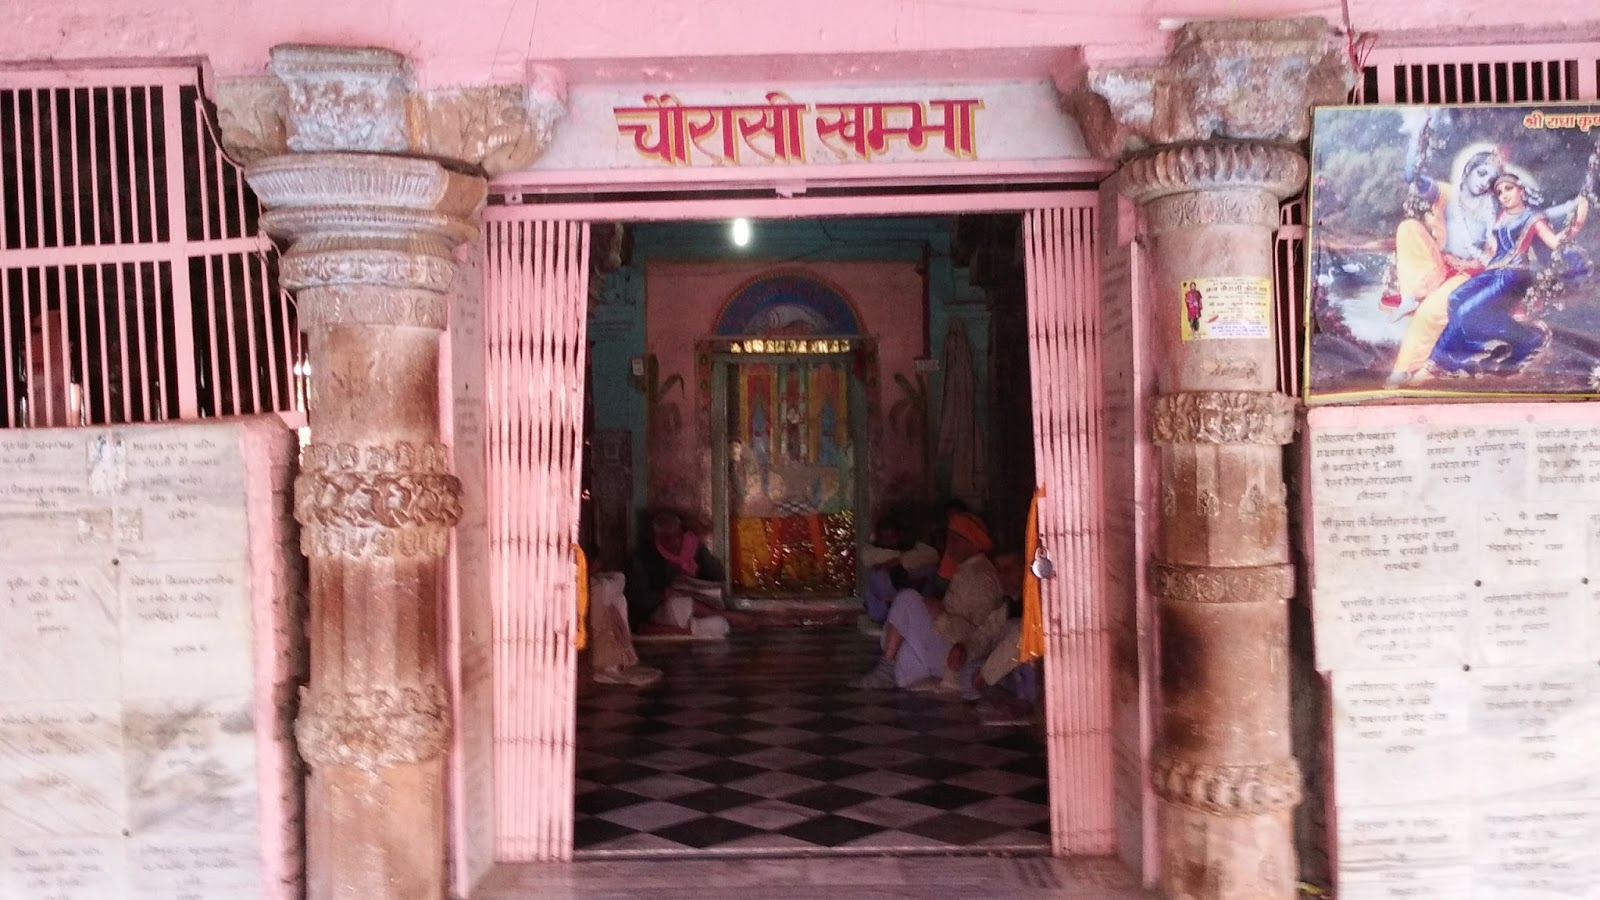 PunjabKesari, Chaurasi Khamba Temple Gokul, Gokul Nand Bhavan, 84 khamba mandir rajasthan, Sri krishna, Nand Mahal Gokul, नंद महल गोकुल, Dharmik Sthal, Religious Place In india, Punjab Kesari, Dharm